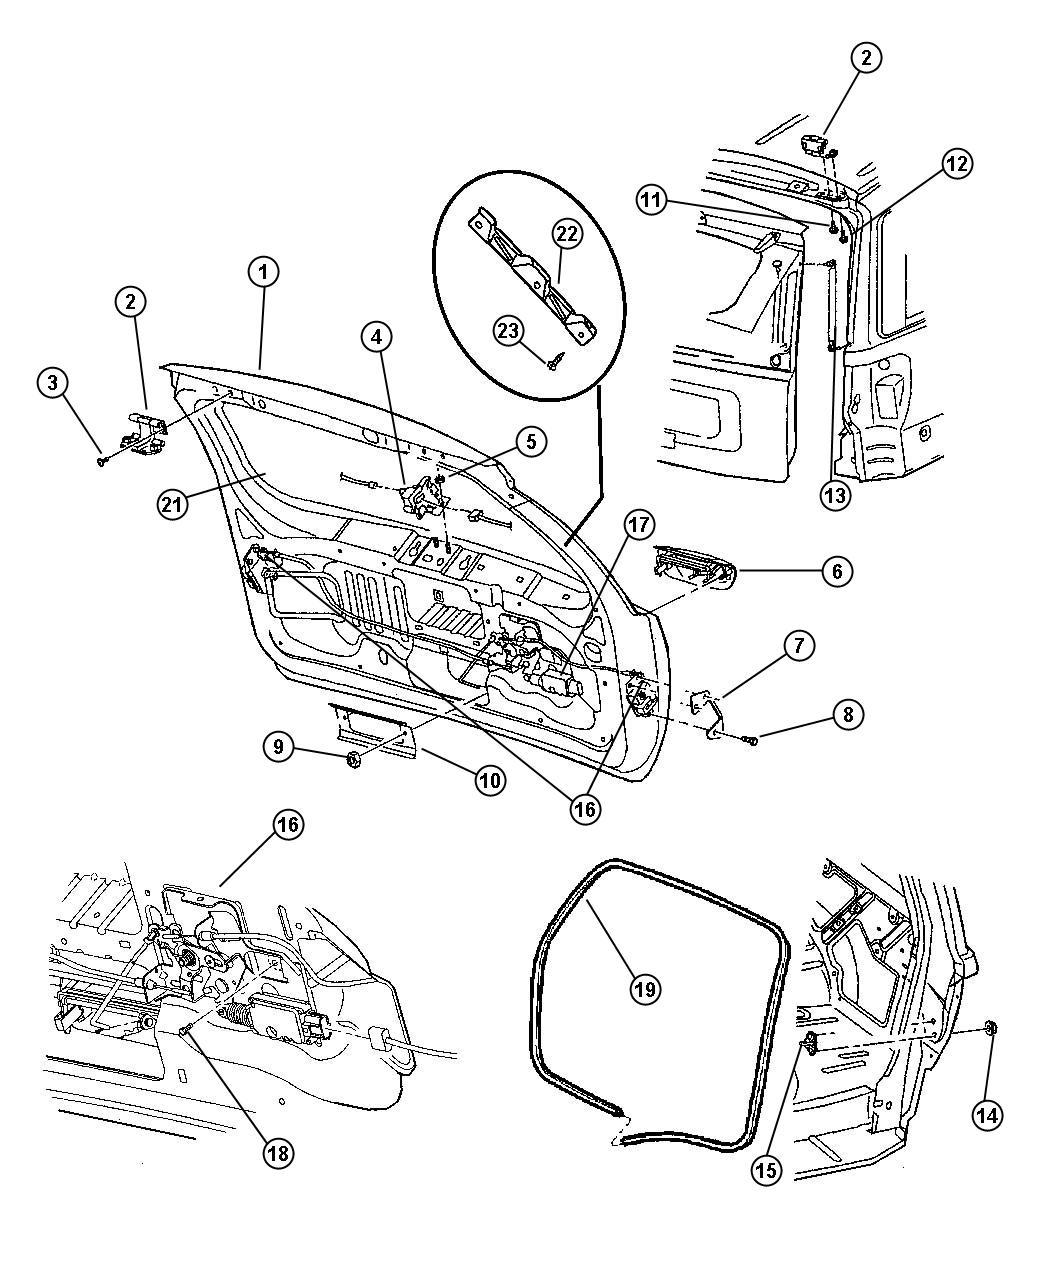 Jeep Grand Cherokee Handle. Liftgate. [x8], laredo, [x8